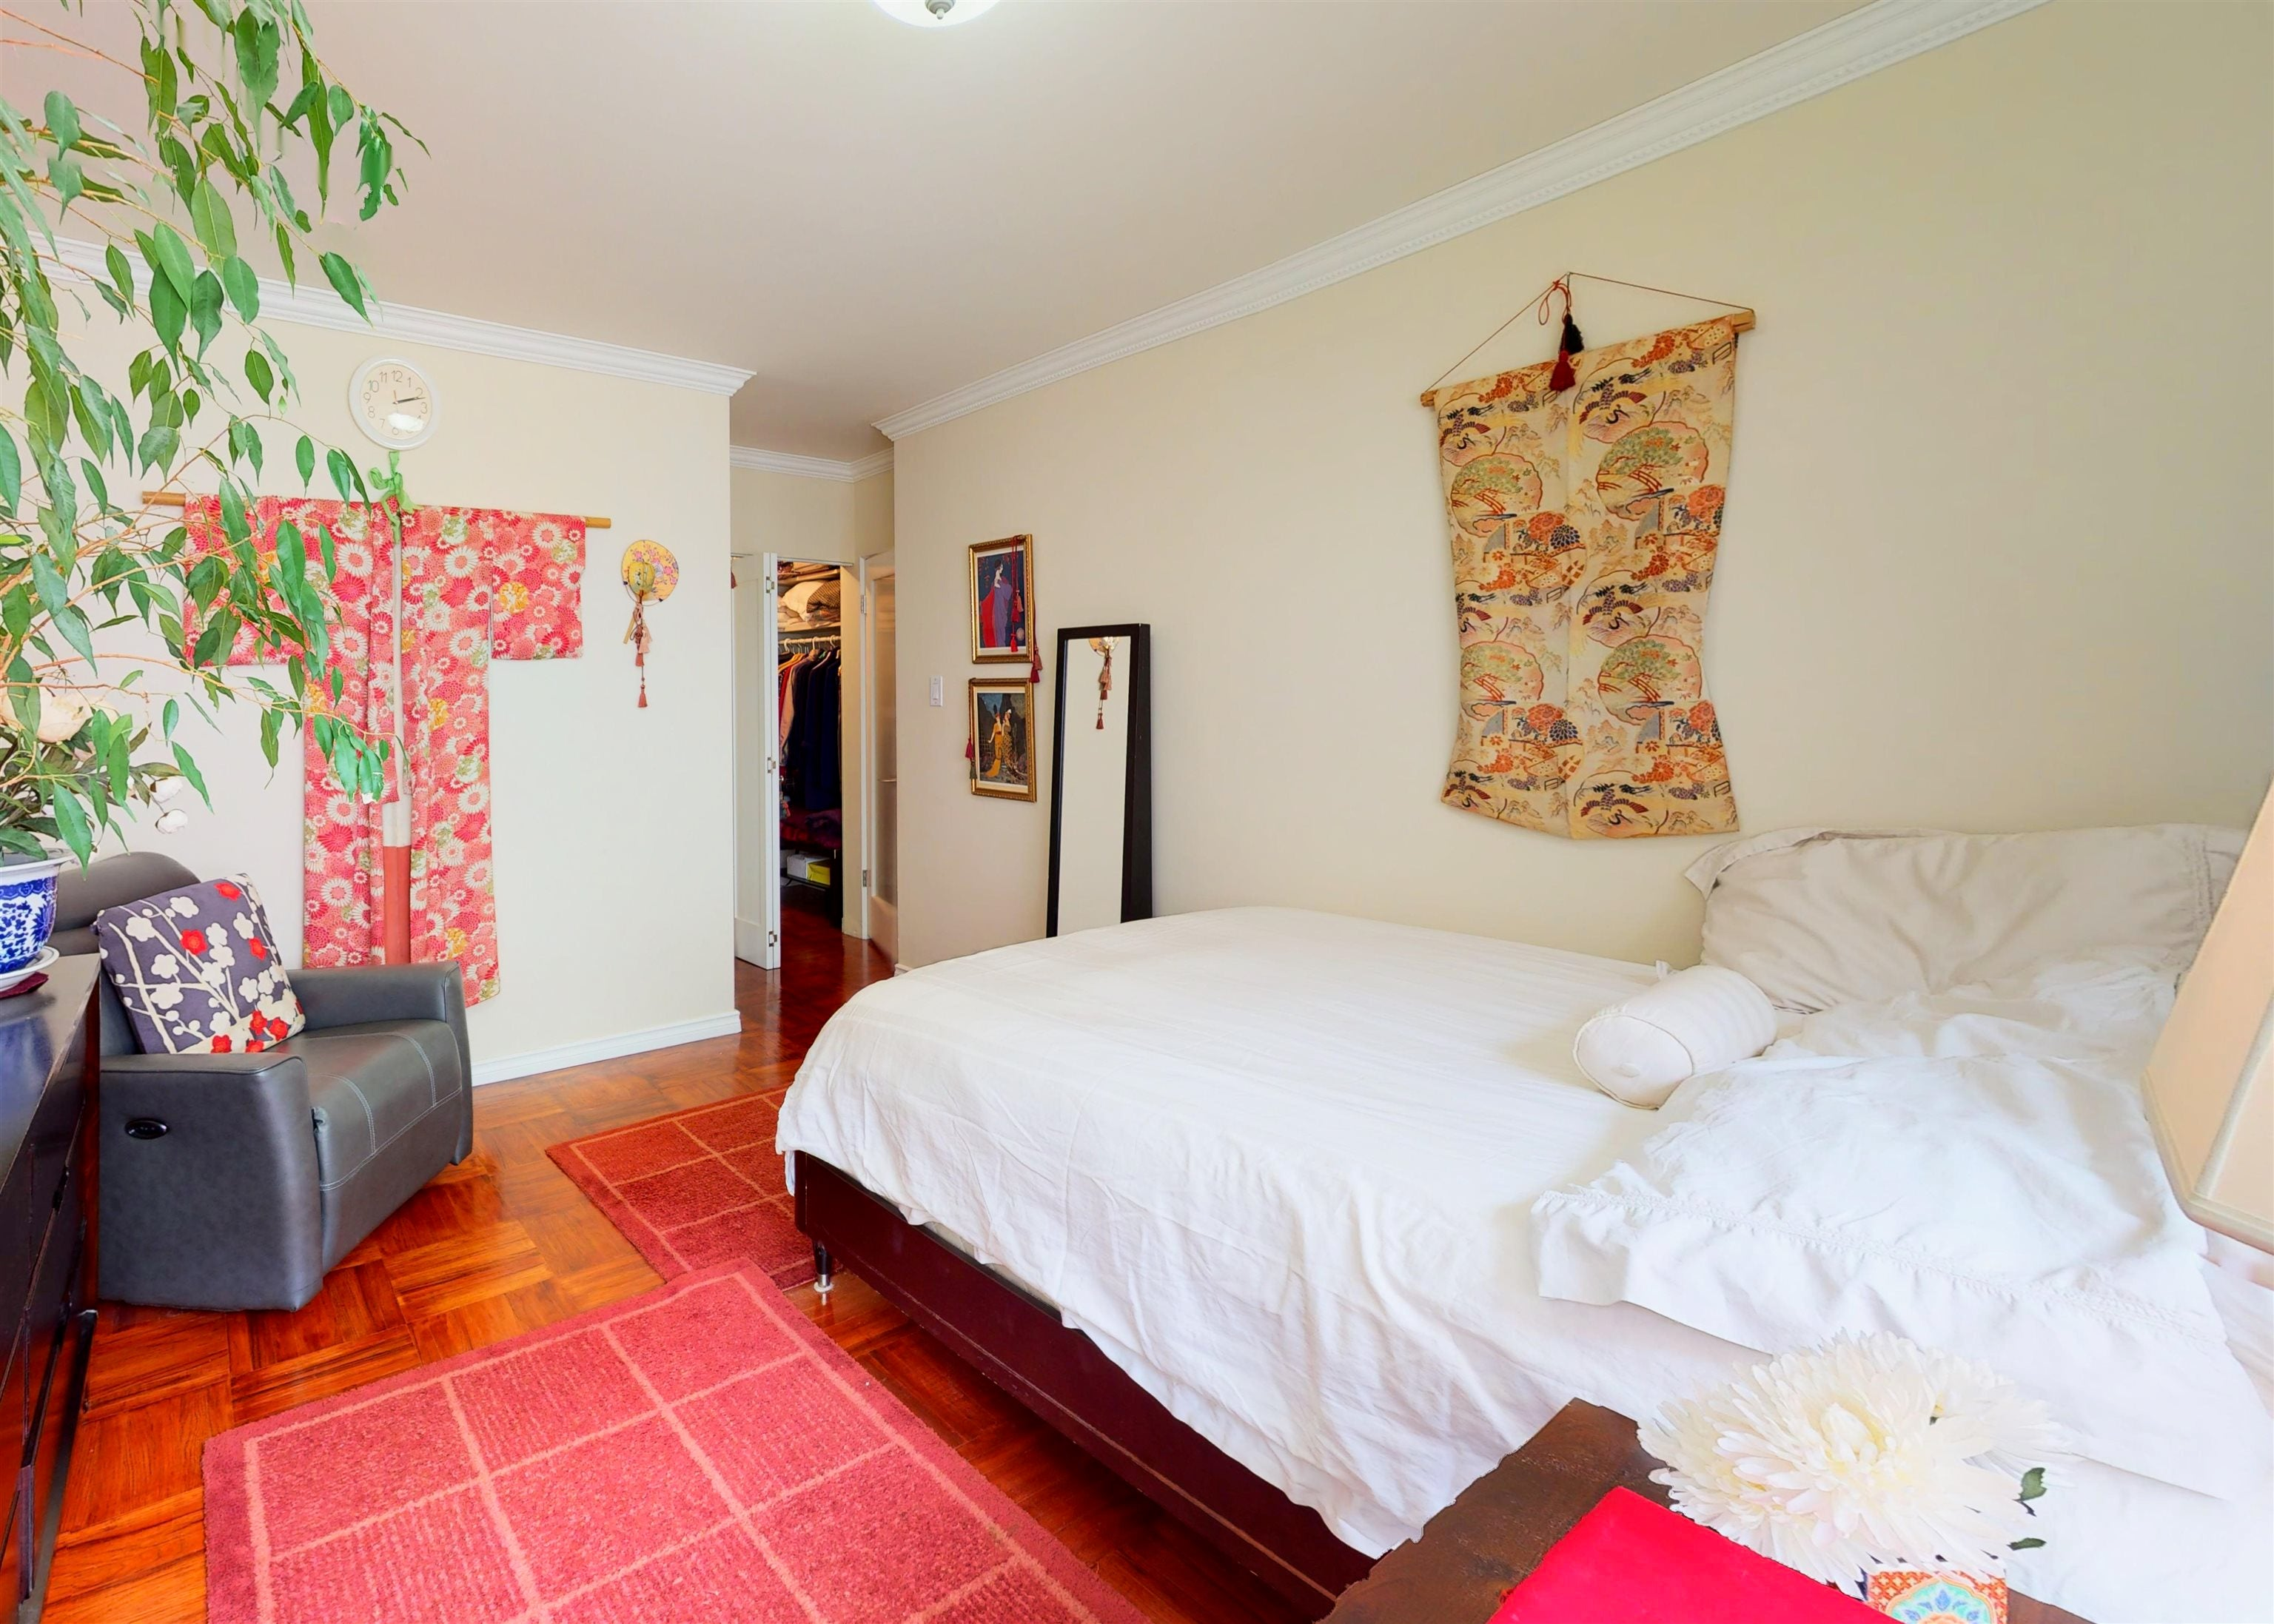 202 1750 ESQUIMALT AVENUE - Ambleside Apartment/Condo for sale, 1 Bedroom (R2610188) - #15